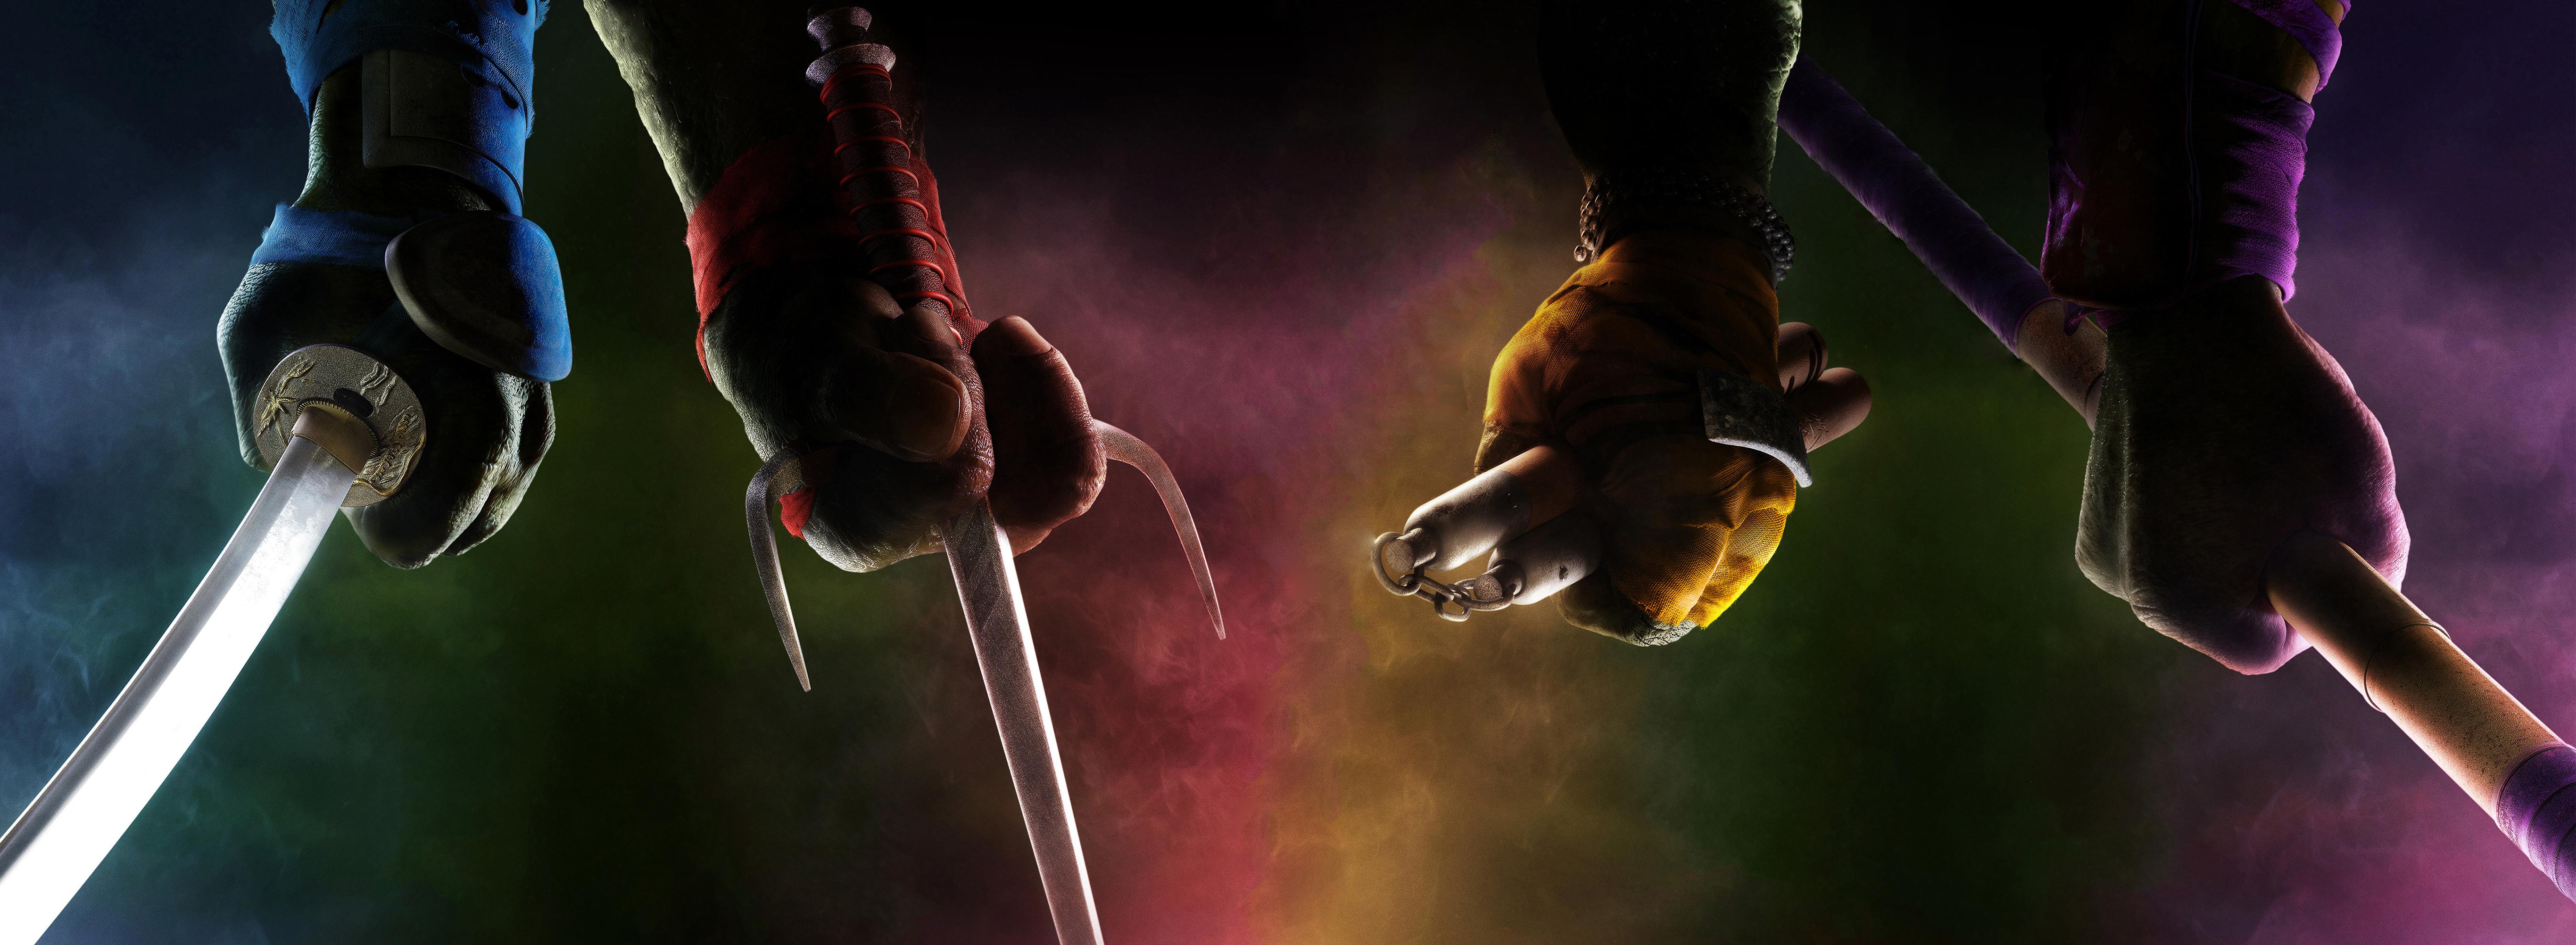 Teenage Mutant Ninja Turtles 2014 Big Poster By Stako On Deviantart